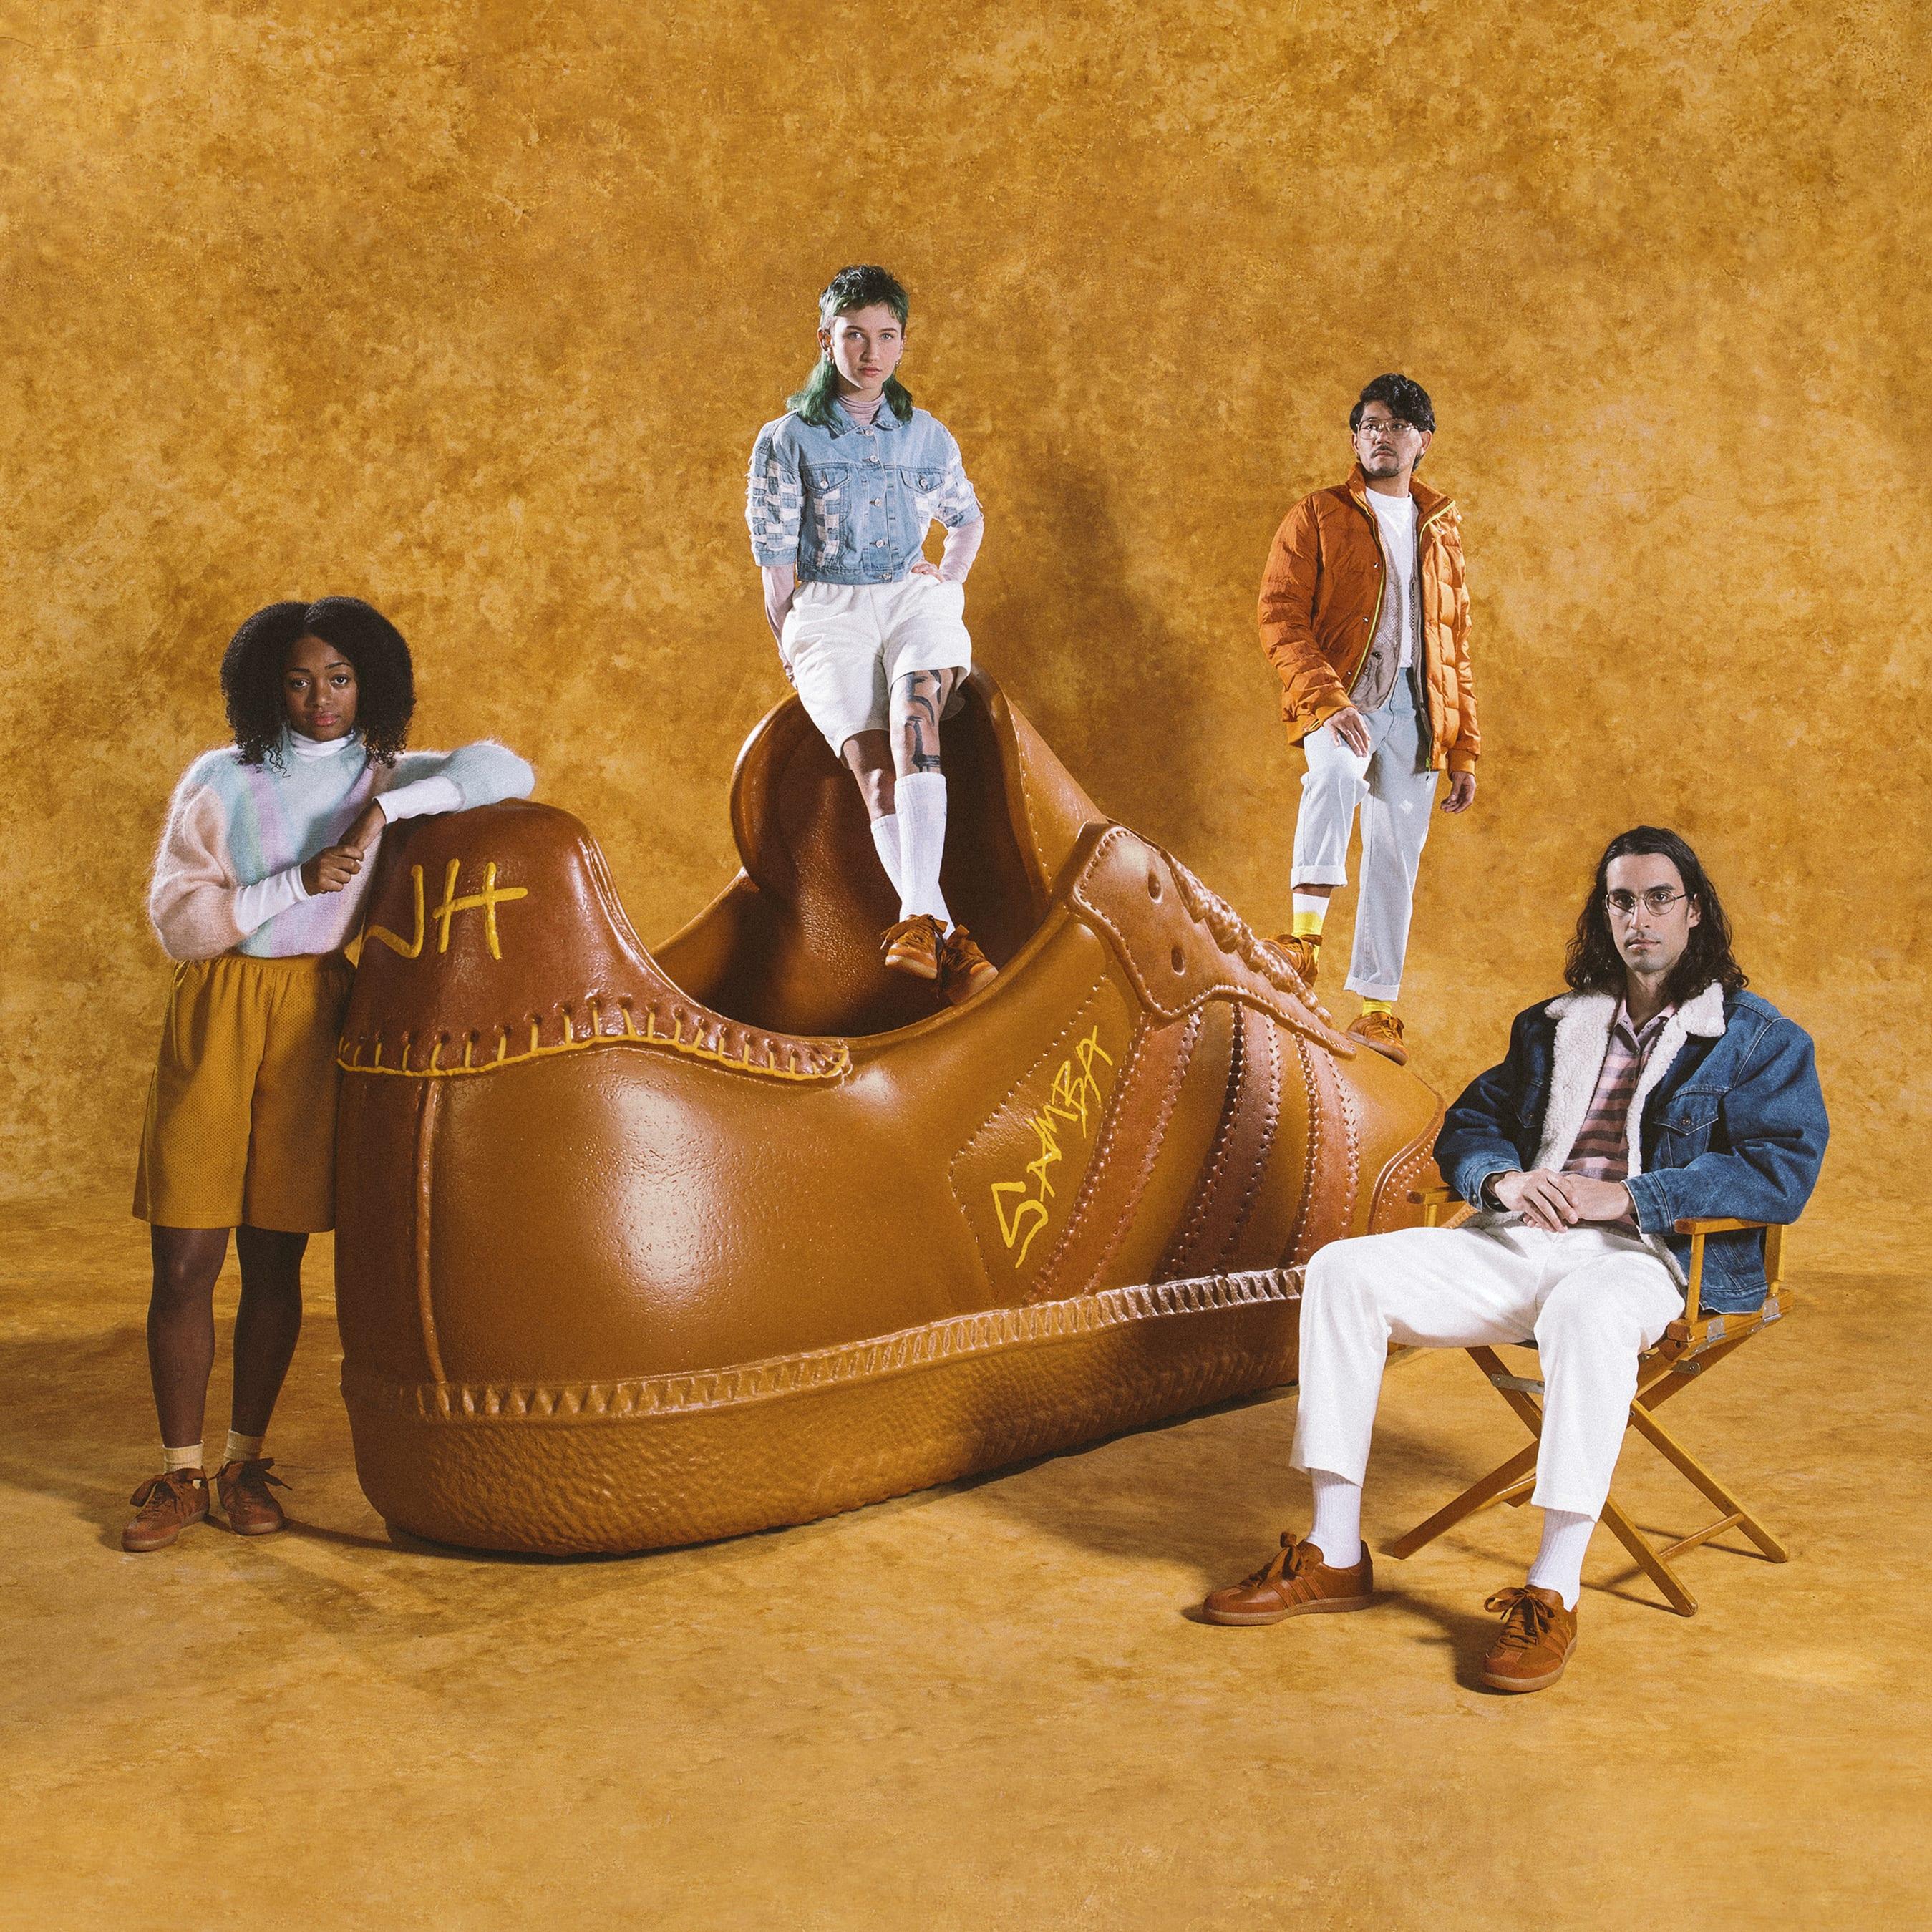 Jonah Hill x Adidas Samba Ochre